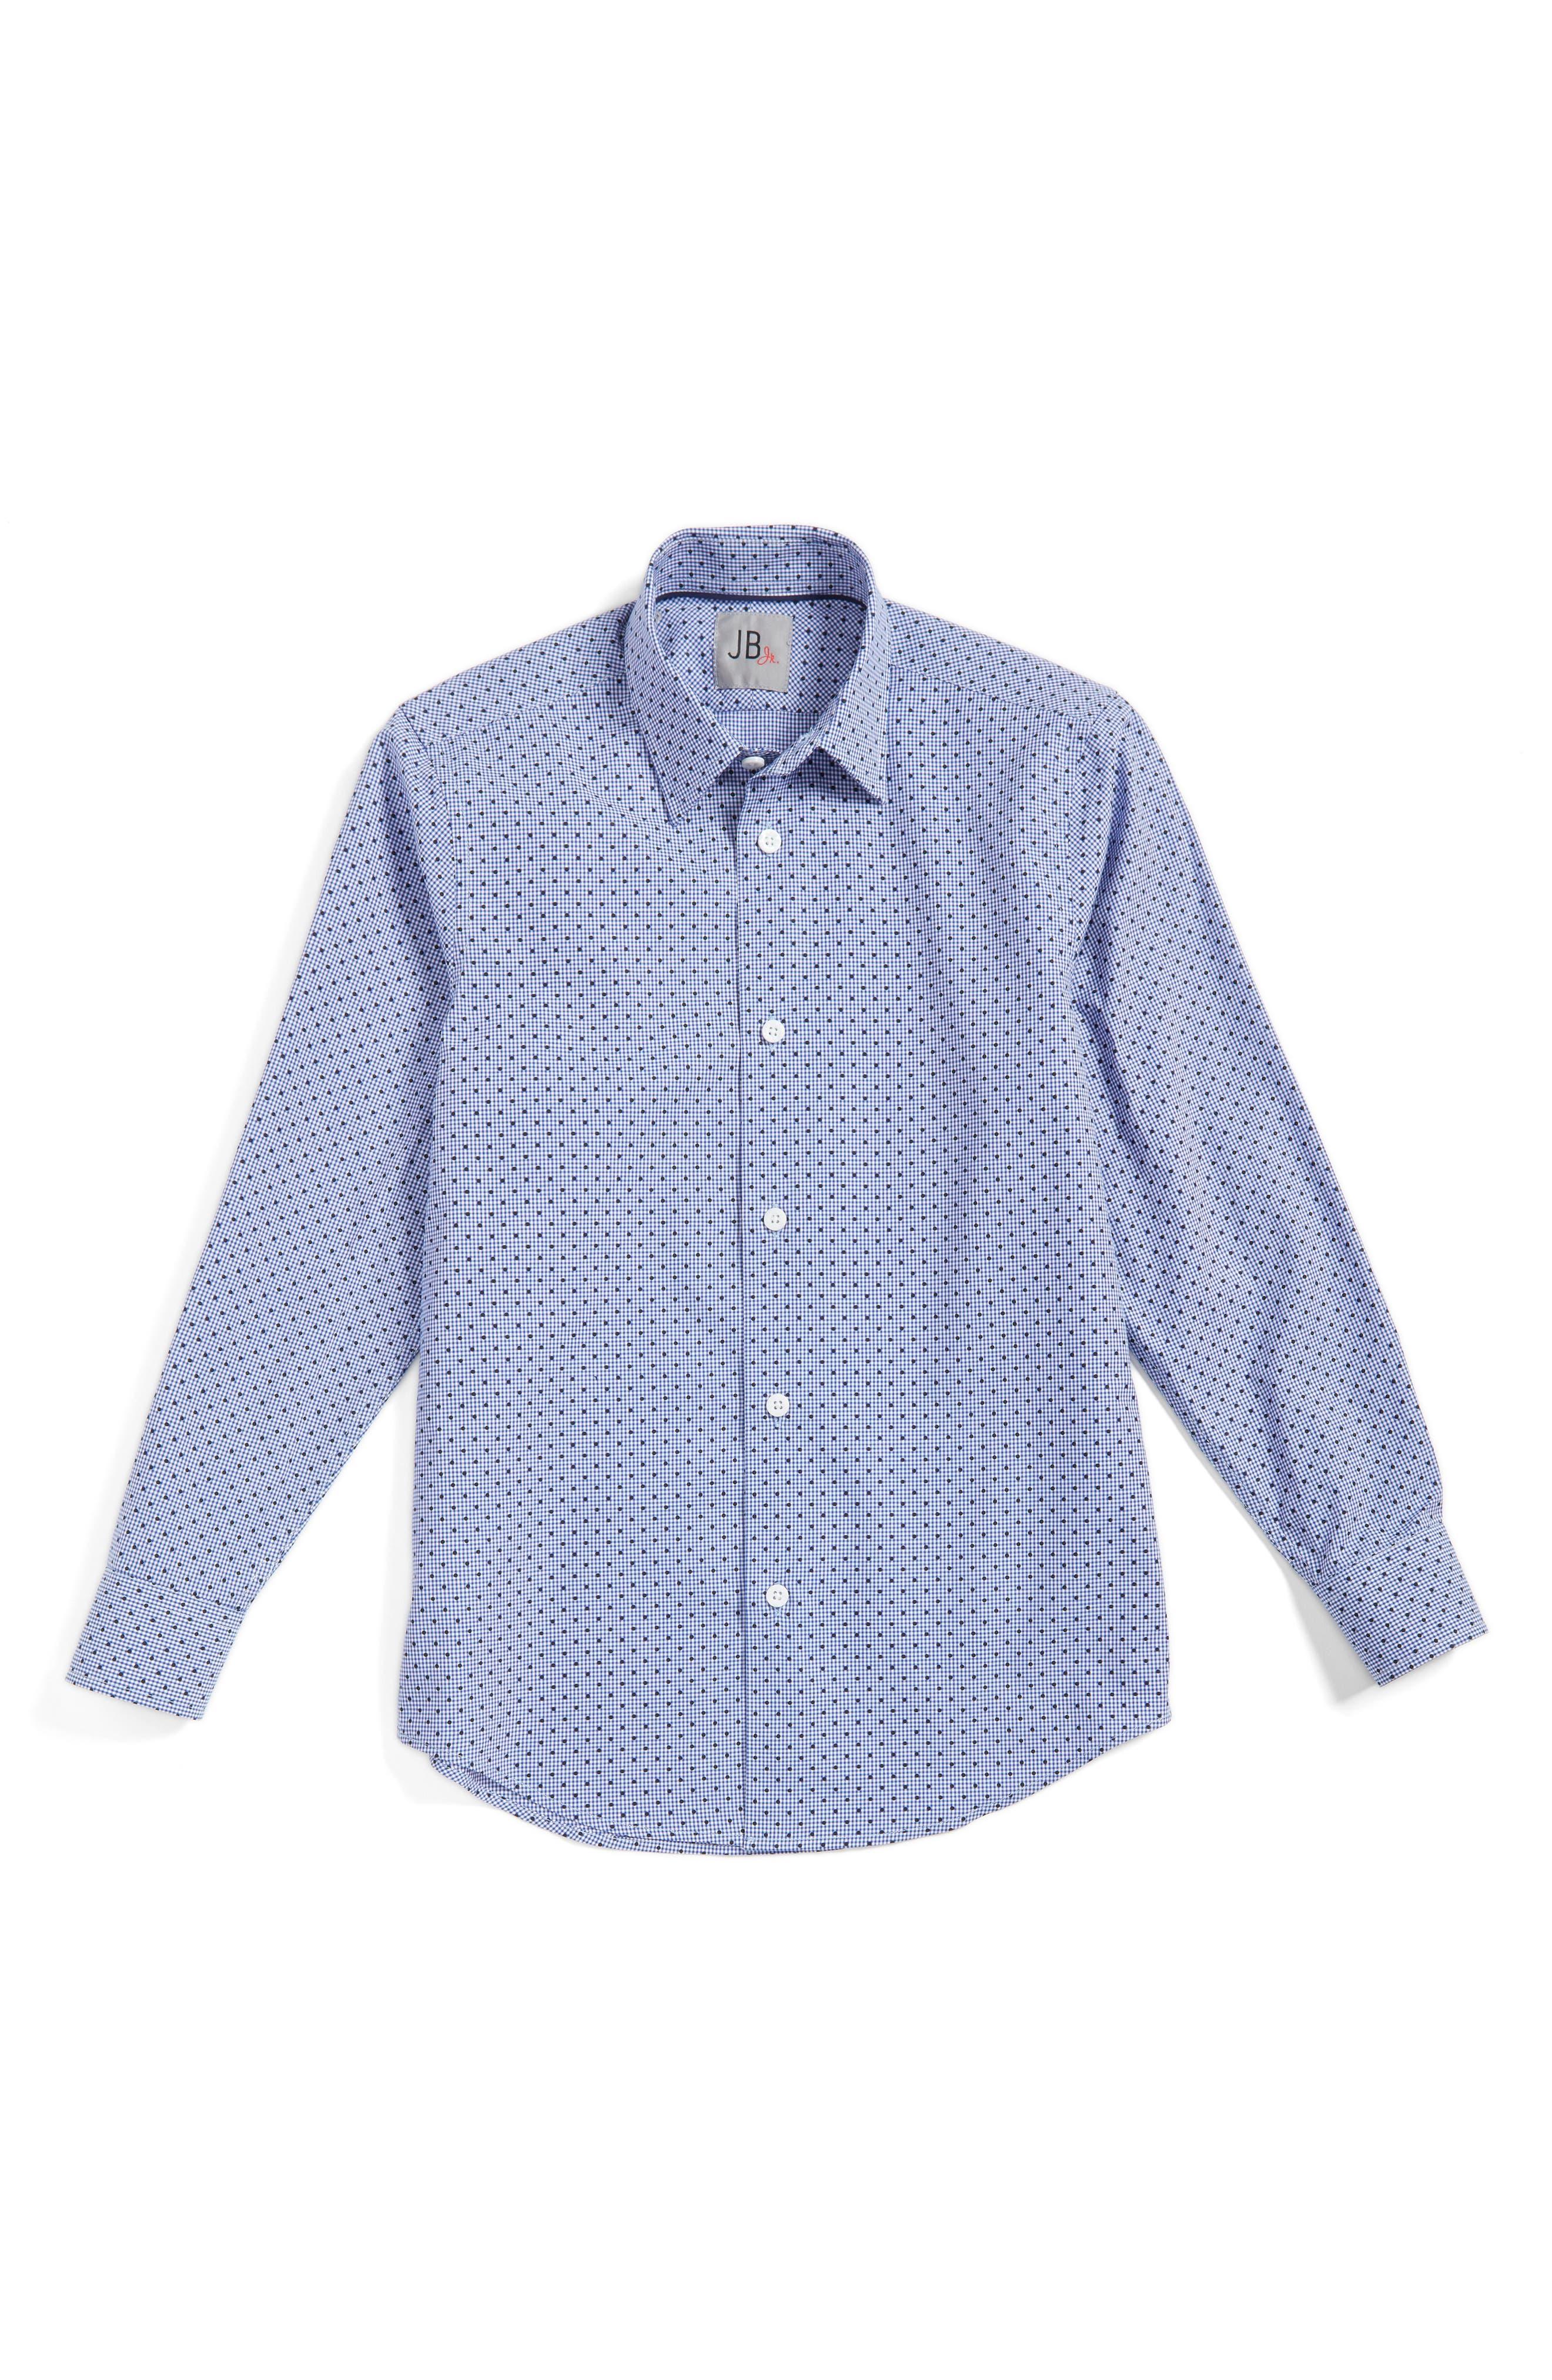 Dot Gingham Dress Shirt,                         Main,                         color, Navy